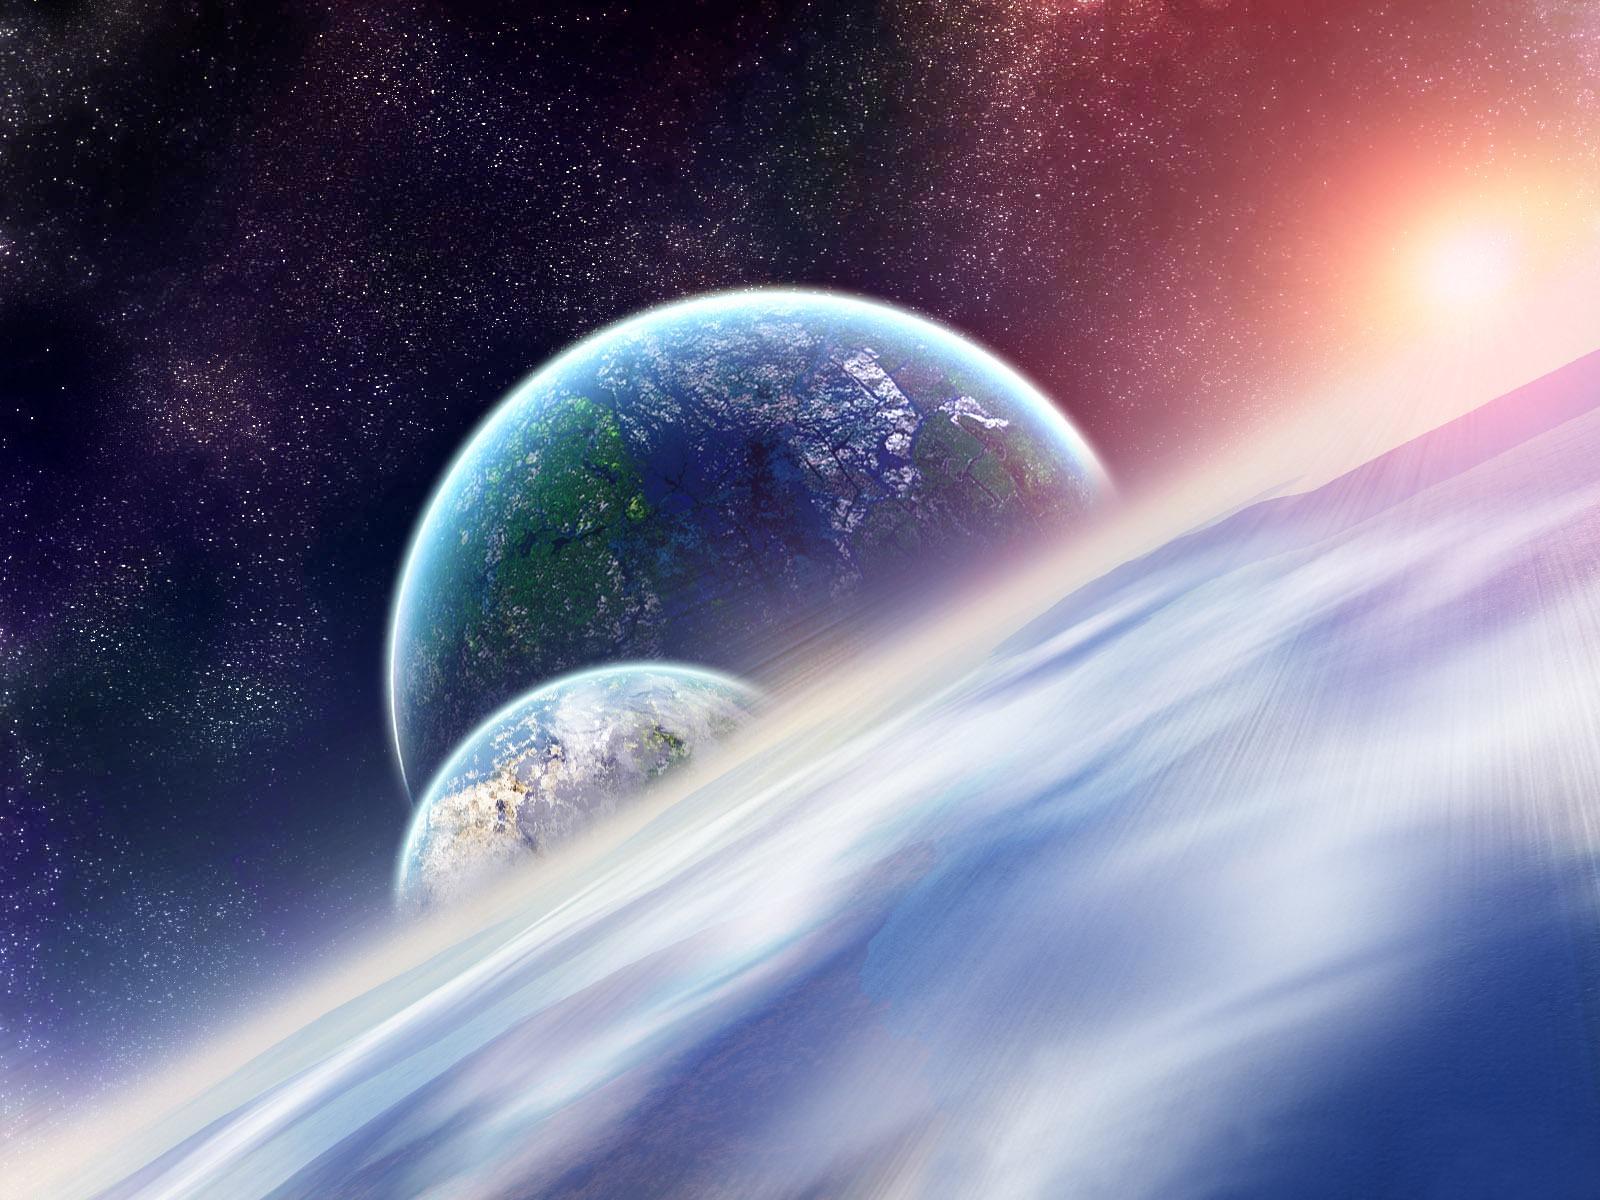 Infinite Universe The Beautiful Star Wallpaper 40